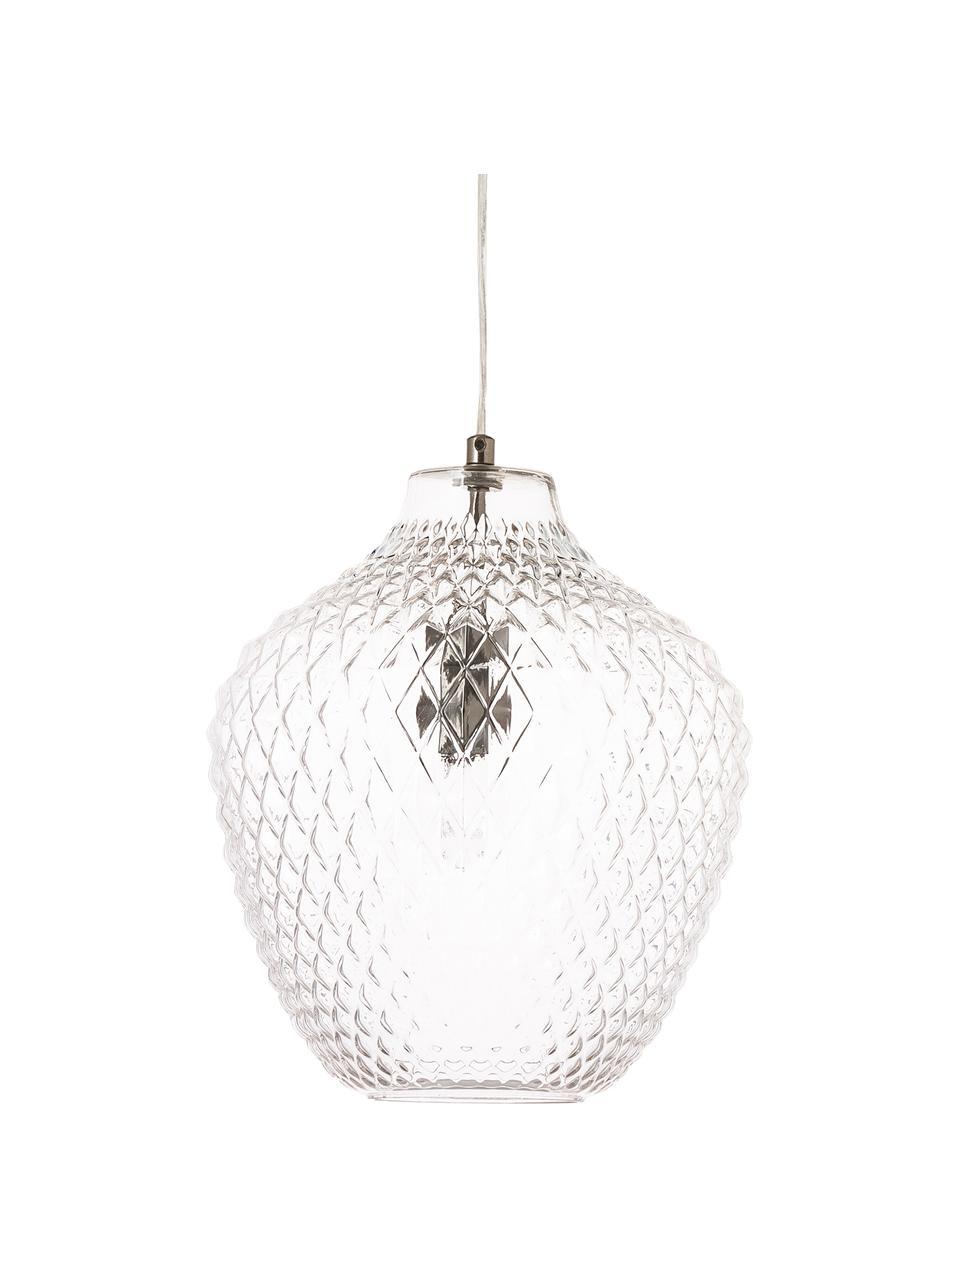 Petite suspension en verre Lee, Transparent, chrome